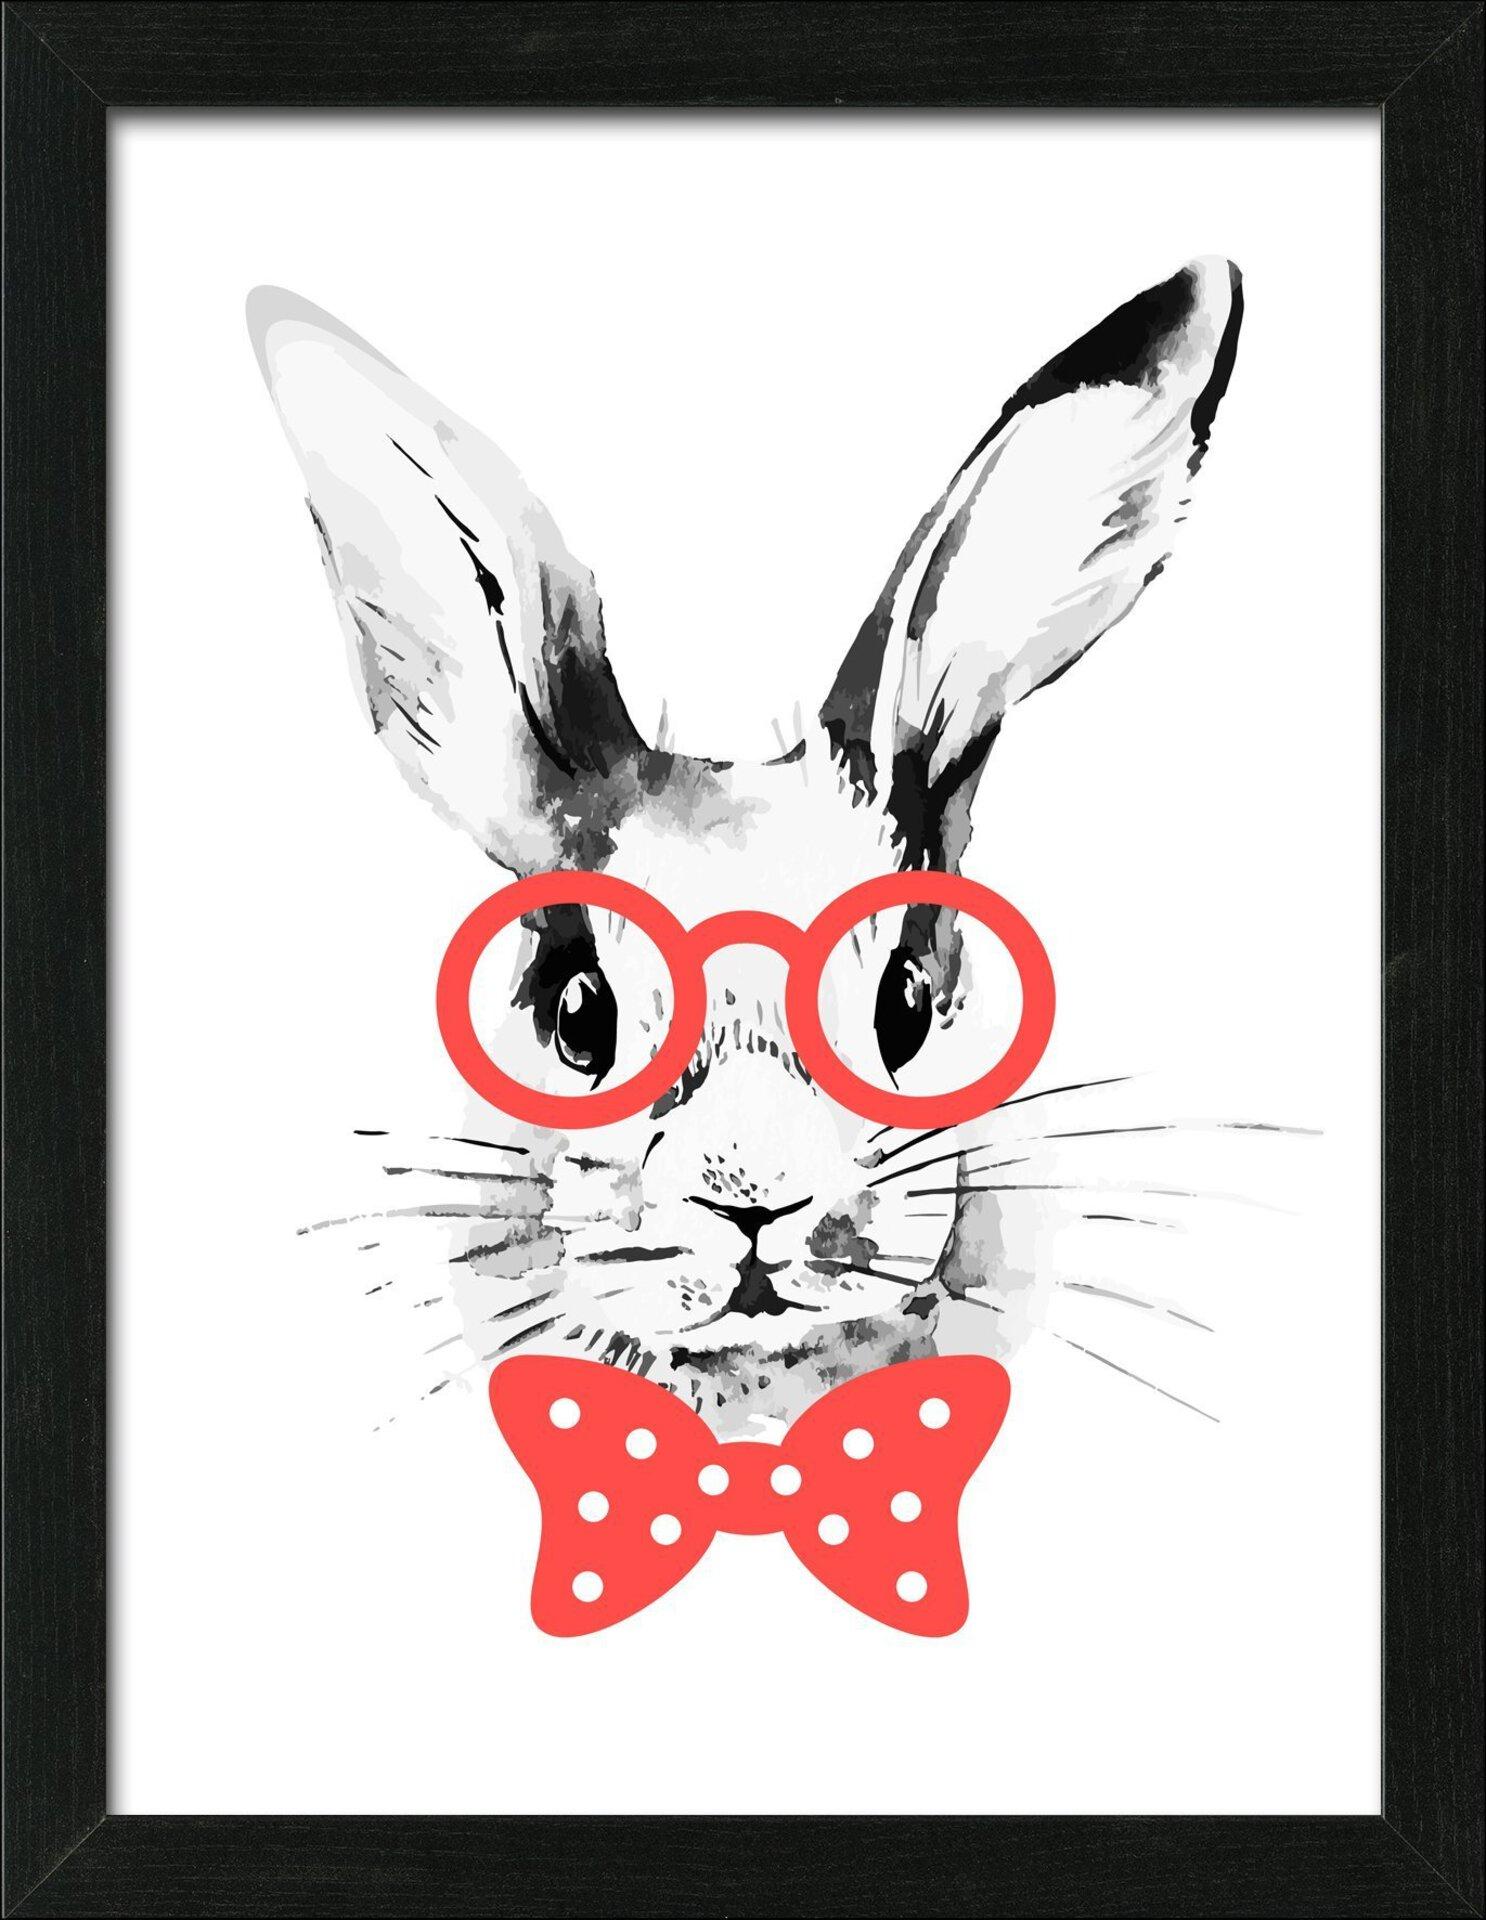 Bild Crazy Rabbit Pro-Art Holzwerkstoff 45 x 35 x 3 cm